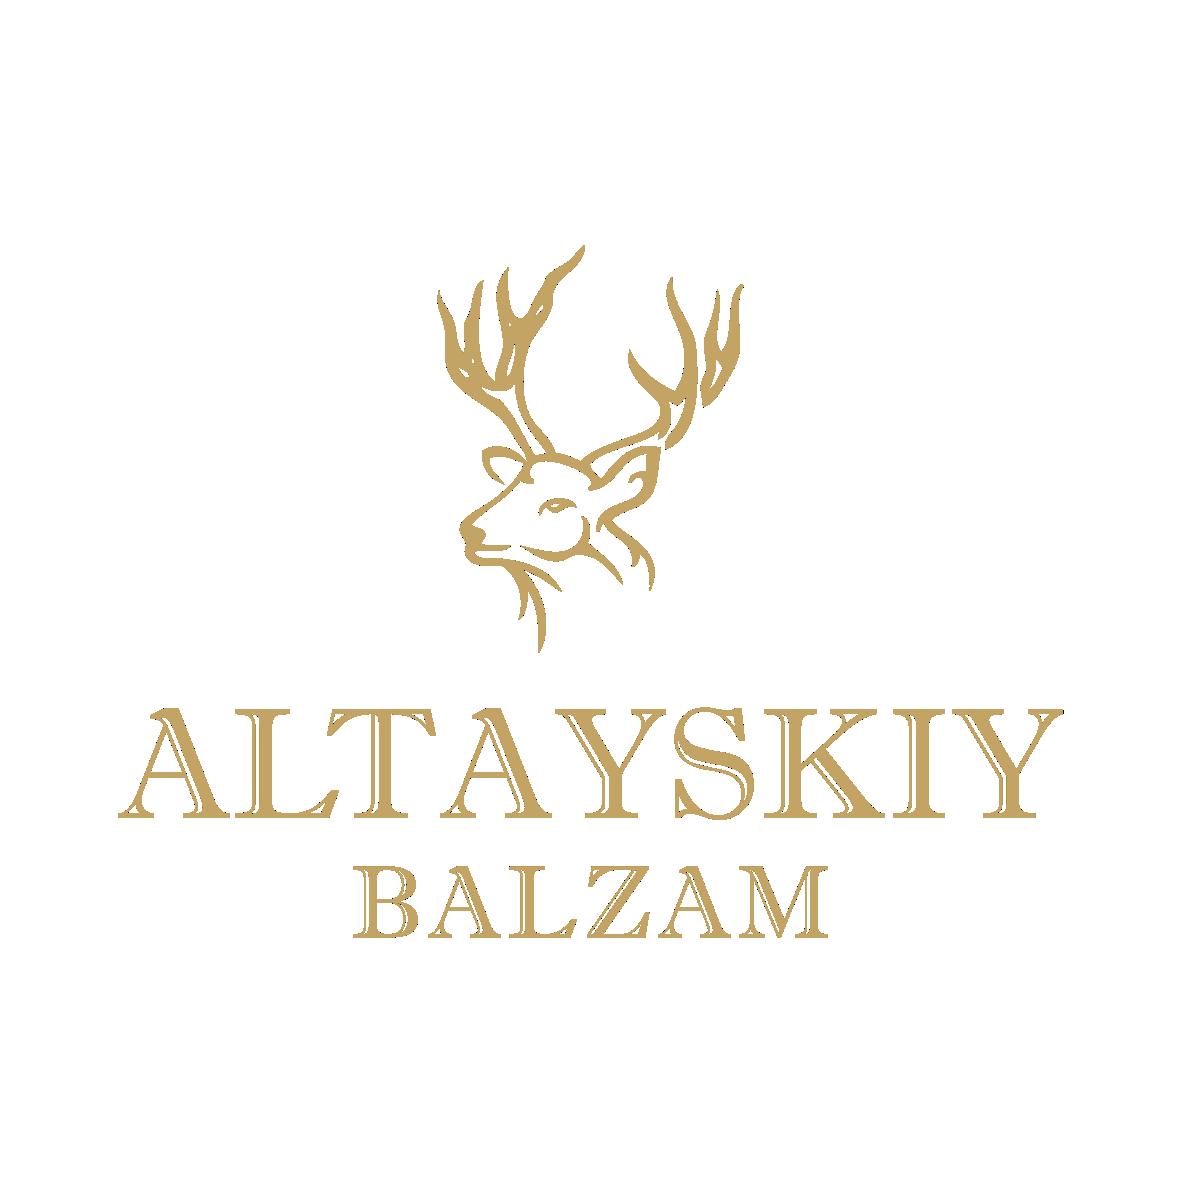 logos_altai_balsam